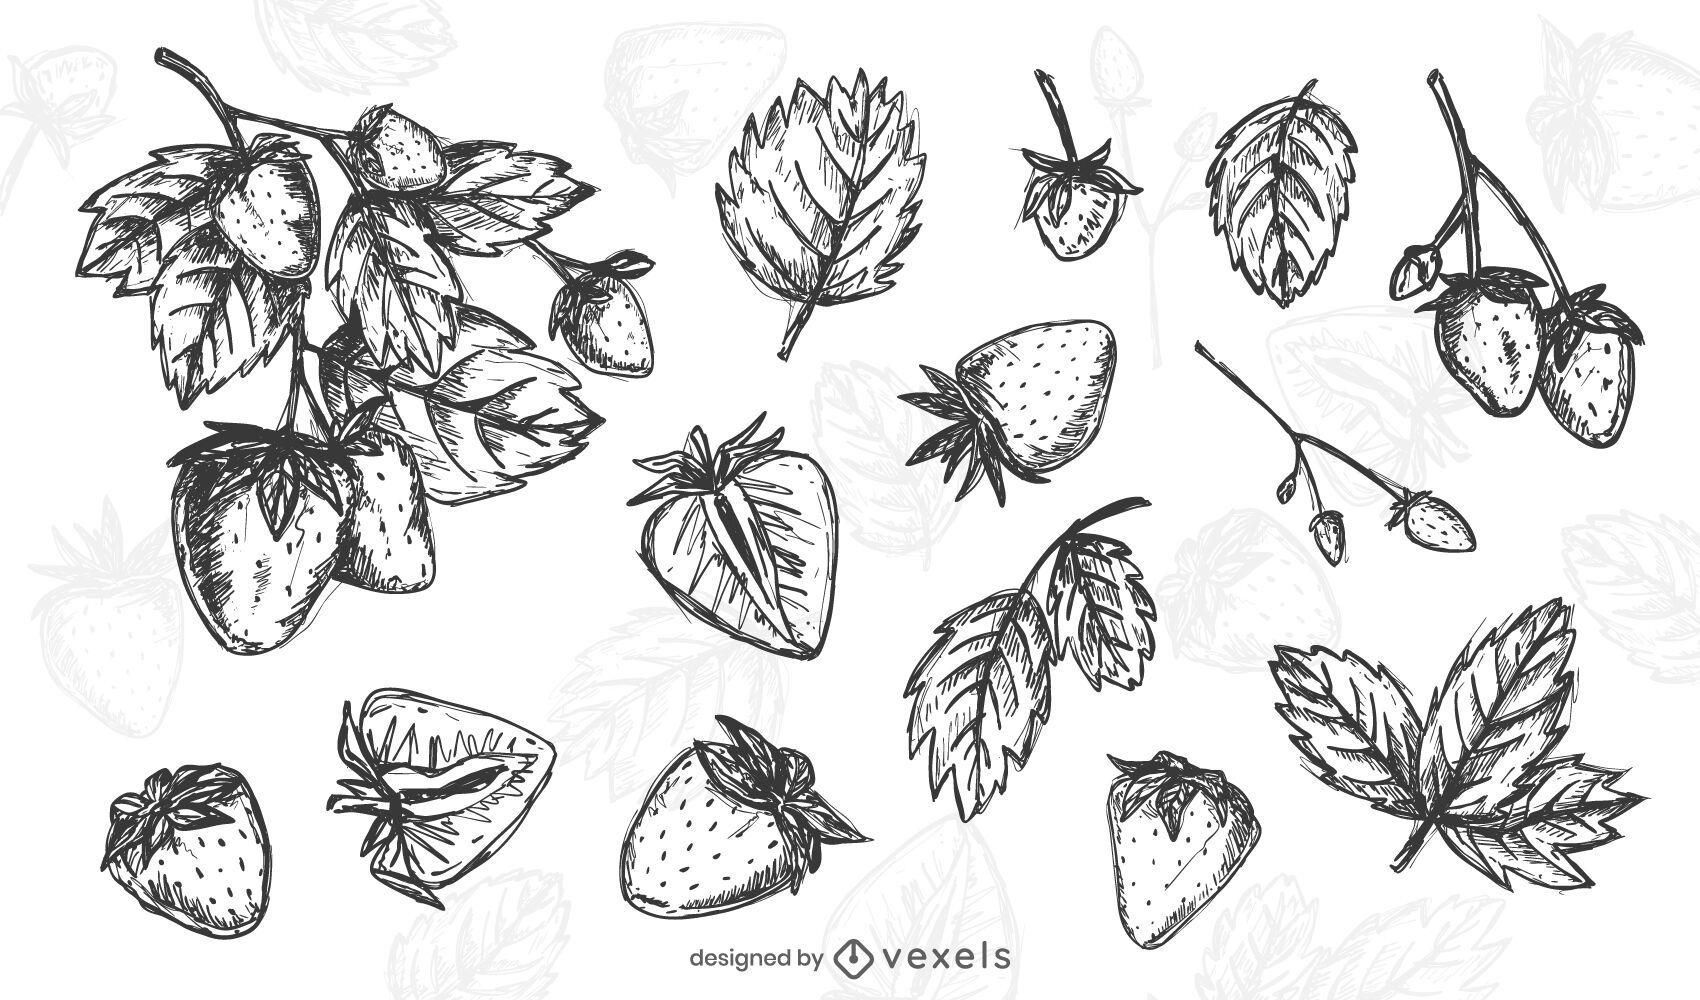 Conjunto de fresa dibujado a mano